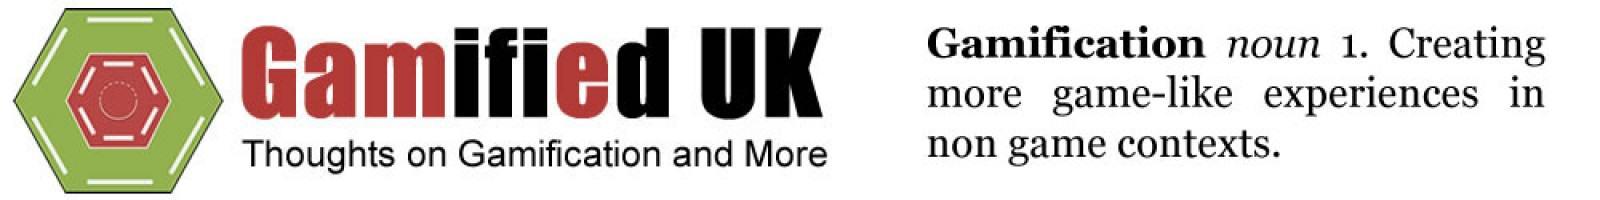 Gamified UK News